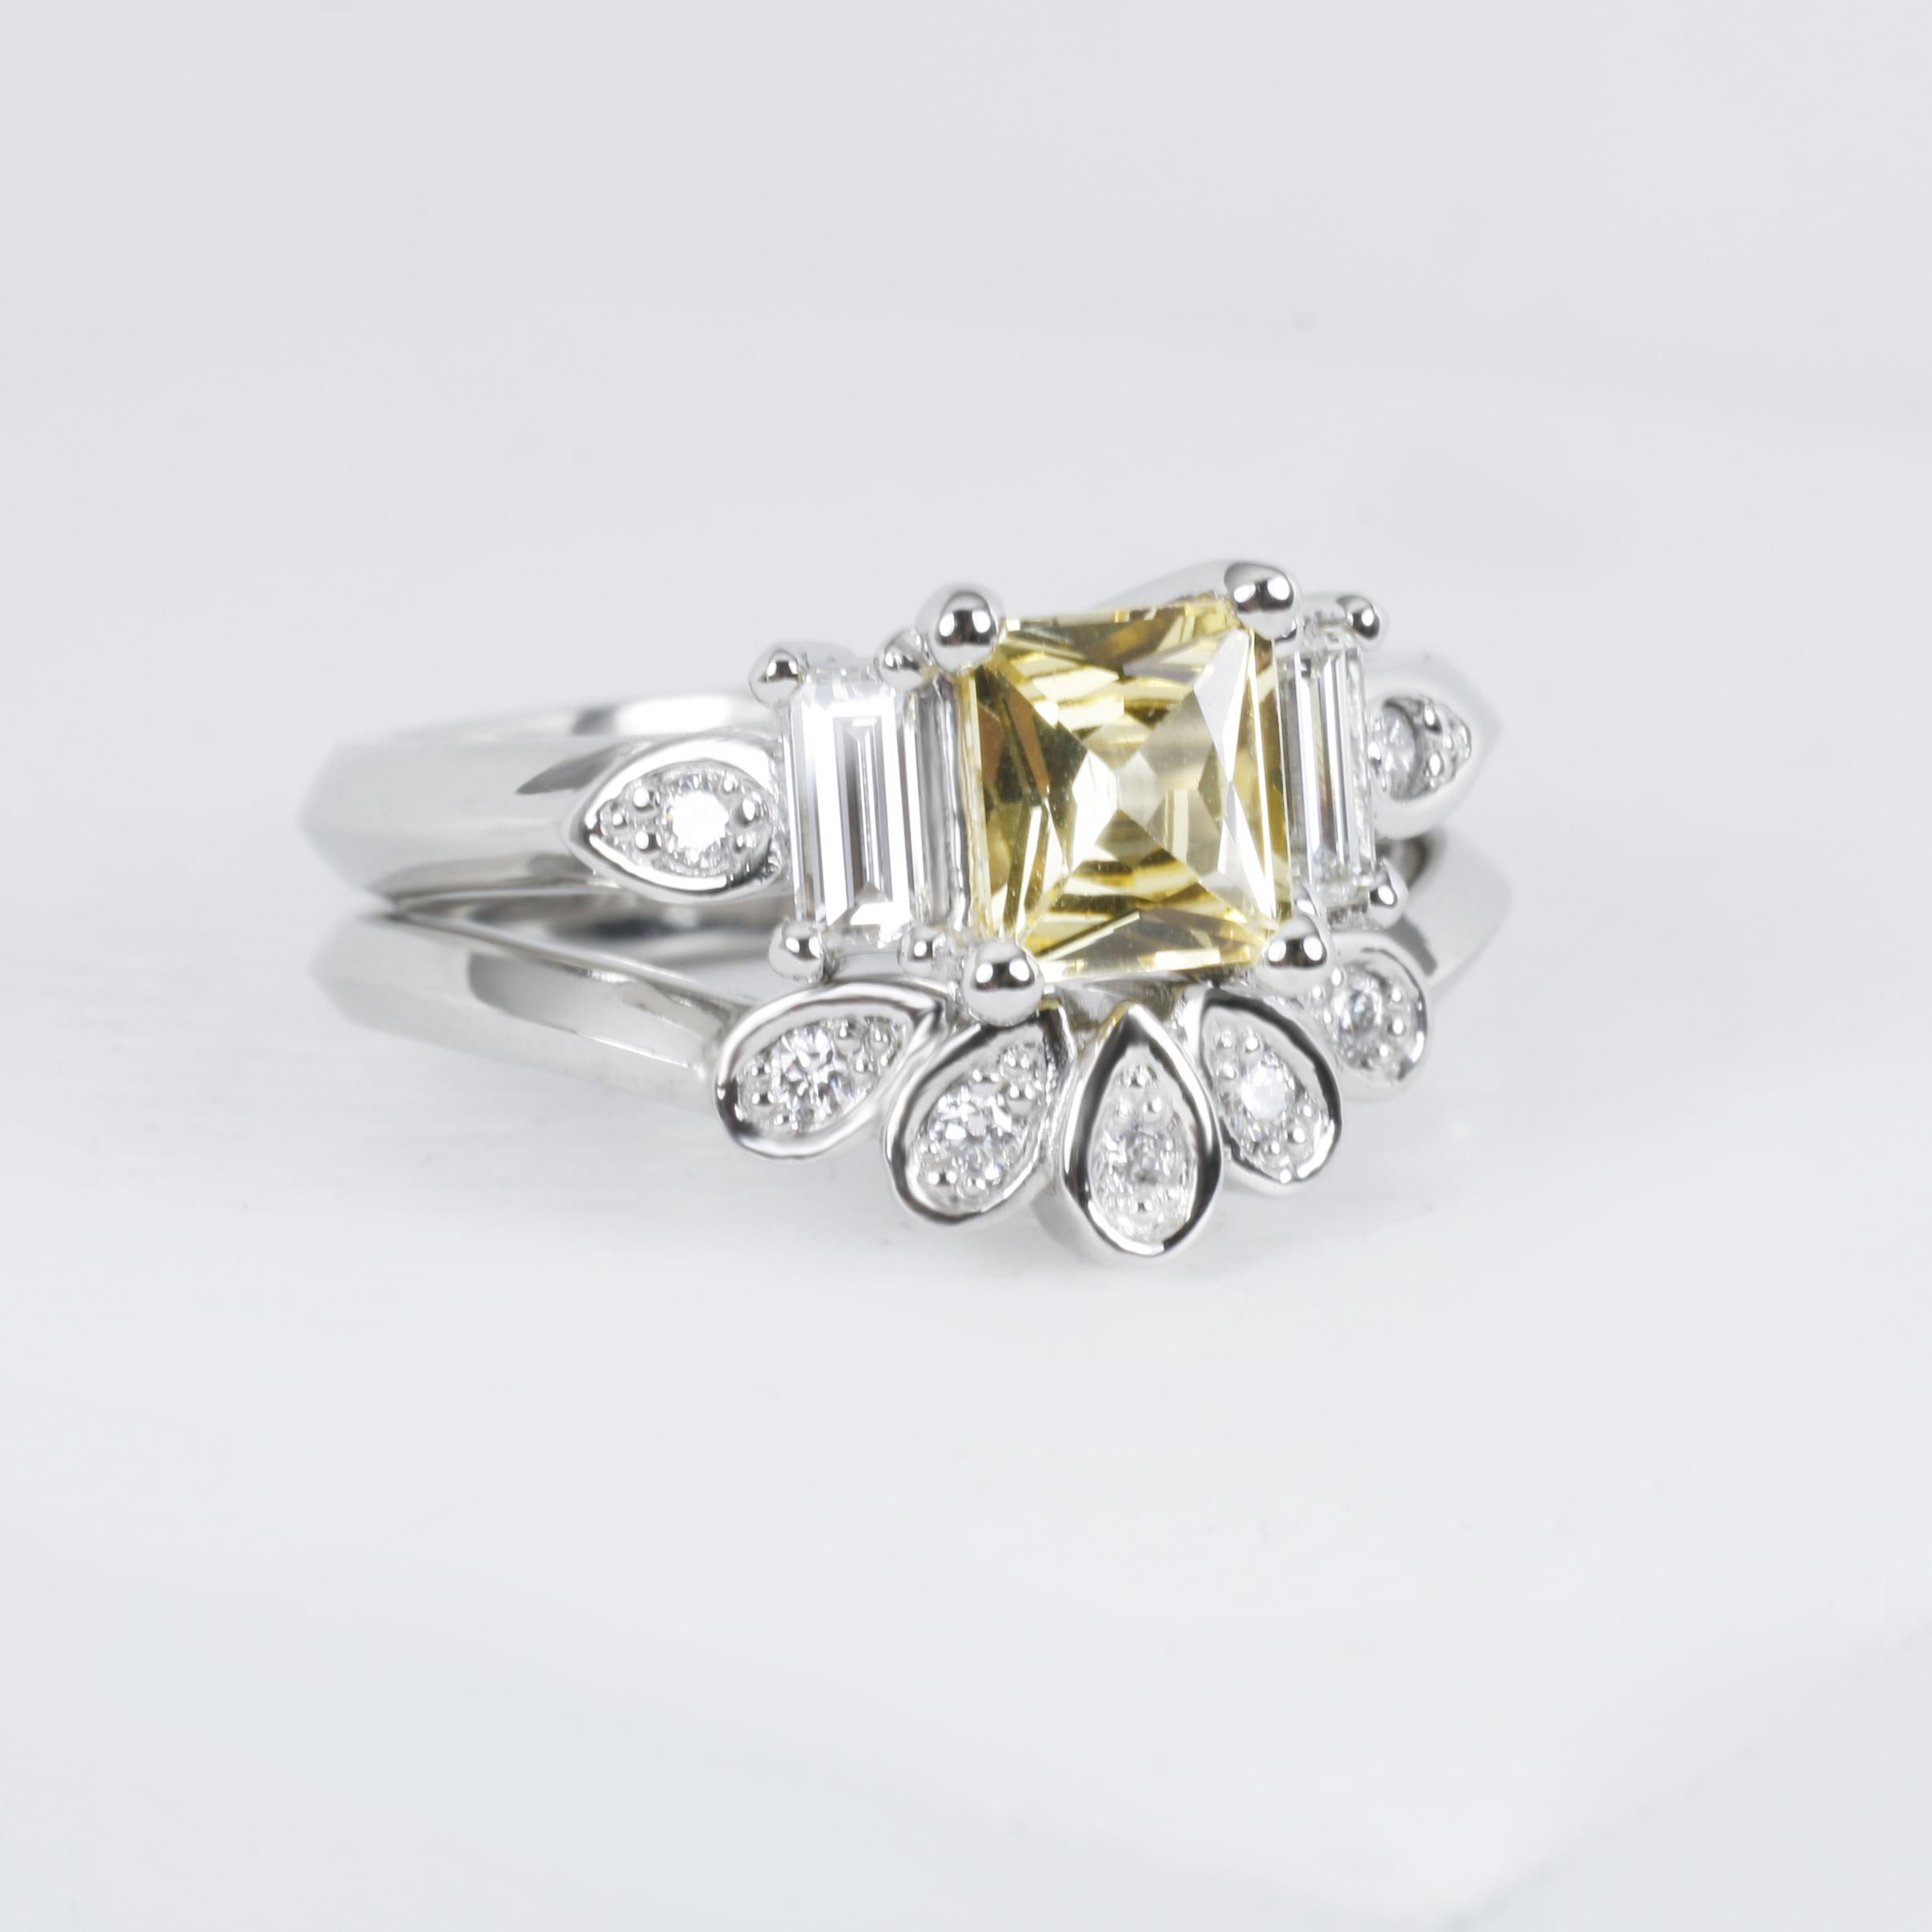 Platinum, Yellow sapphire and diamond wedding ring set./>               </div>               <div class=